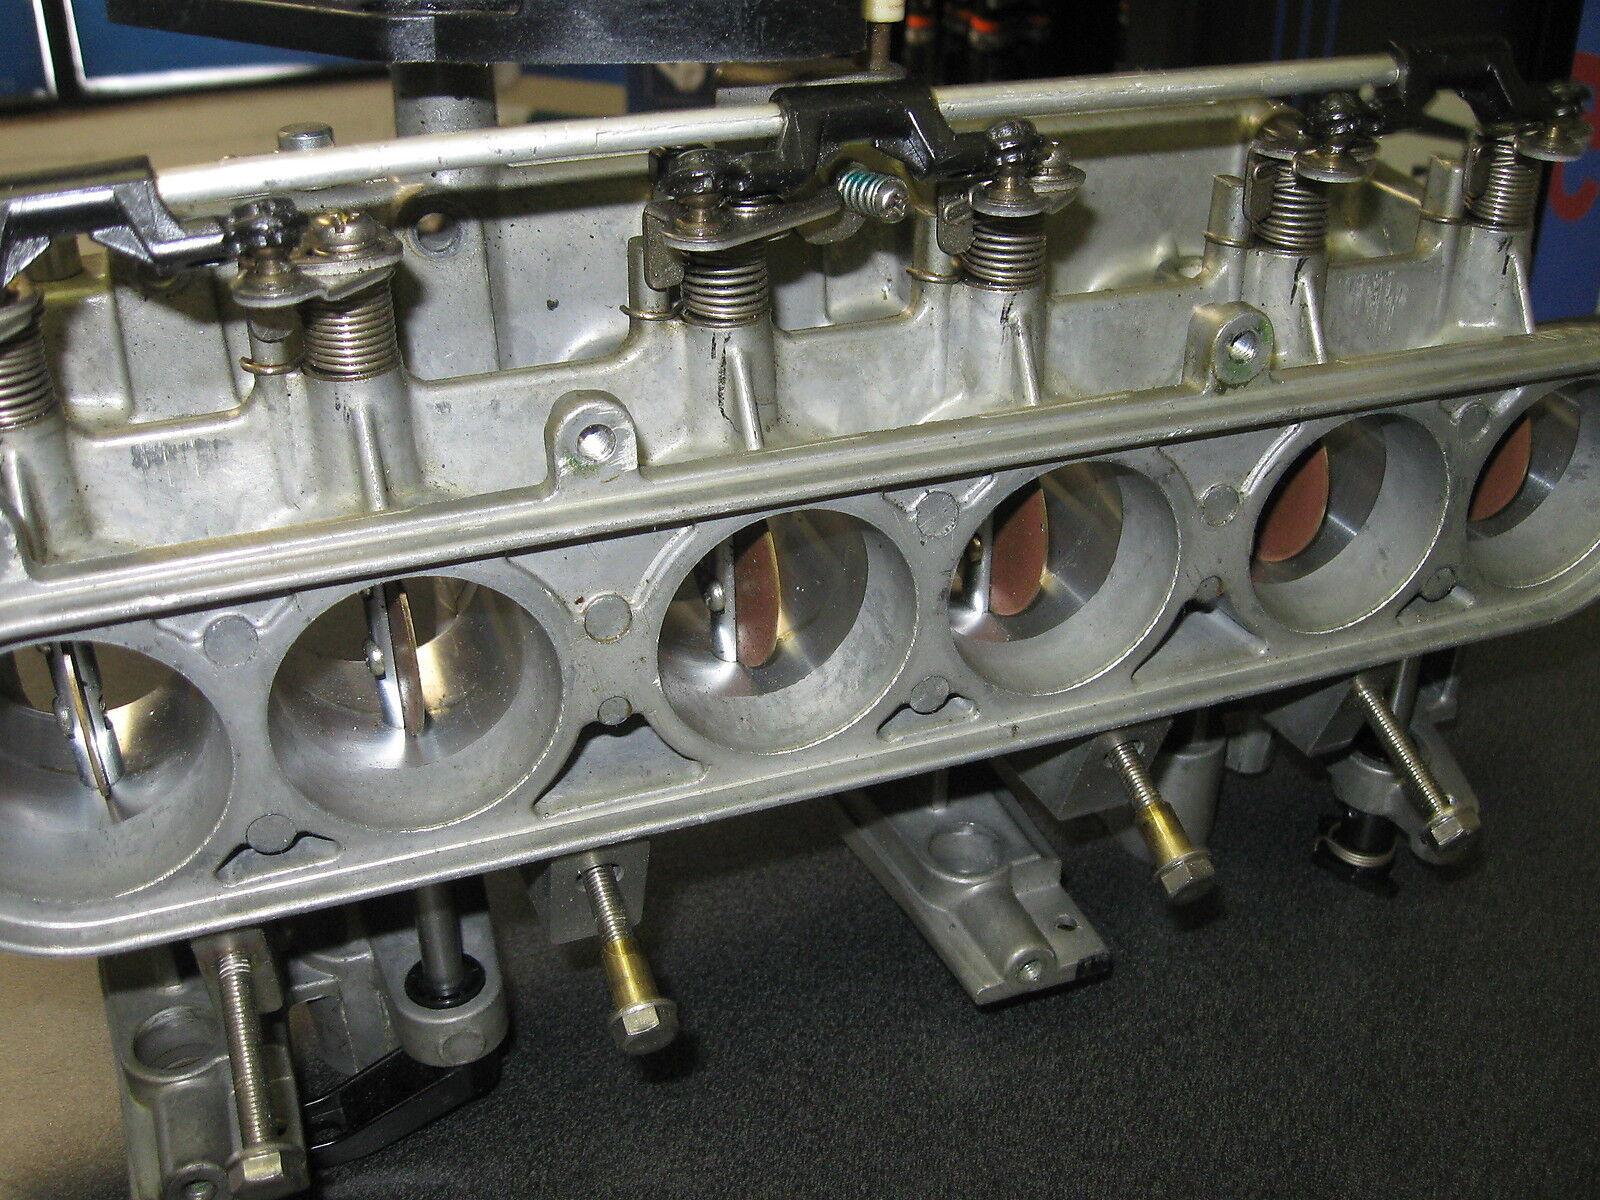 Yamaha Teilenummer Außenborder Drosselklappengehäuse 1 Teilenummer Yamaha 67H-13751-00-00 2ba760